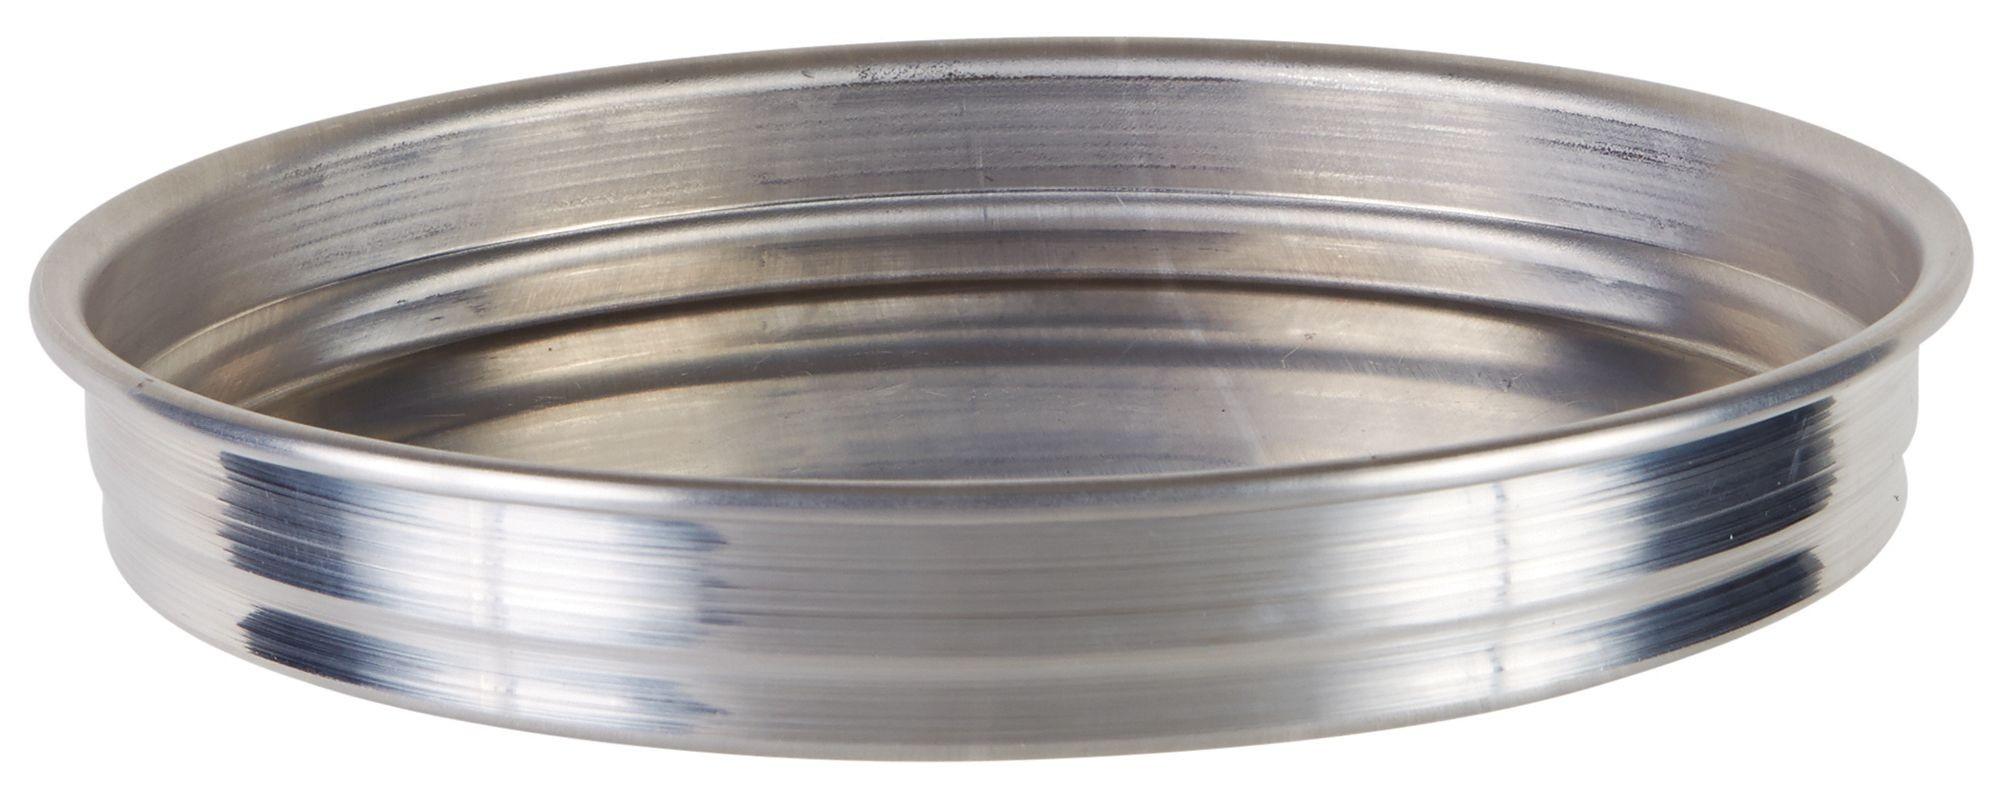 "Winco APZK-0815 8"" x 1-1/2"" Stackable Aluminum Pizza Pan"